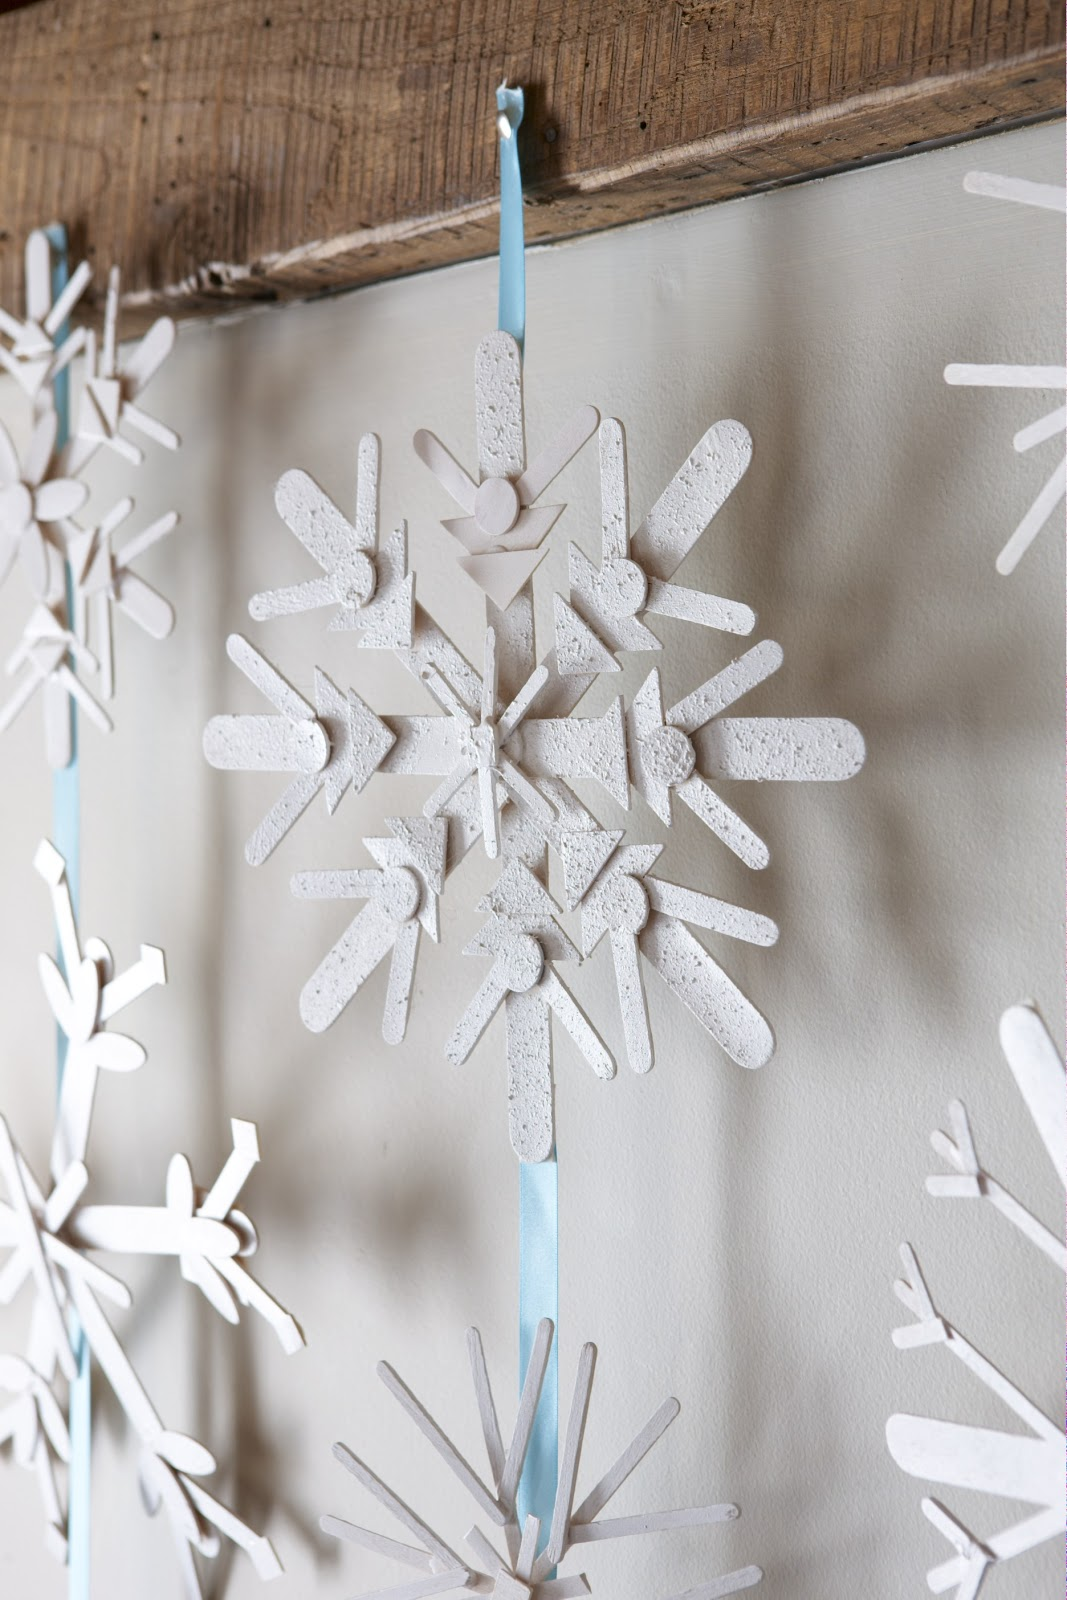 karin lidbeck 16 day count down diy snowflake decor. Black Bedroom Furniture Sets. Home Design Ideas